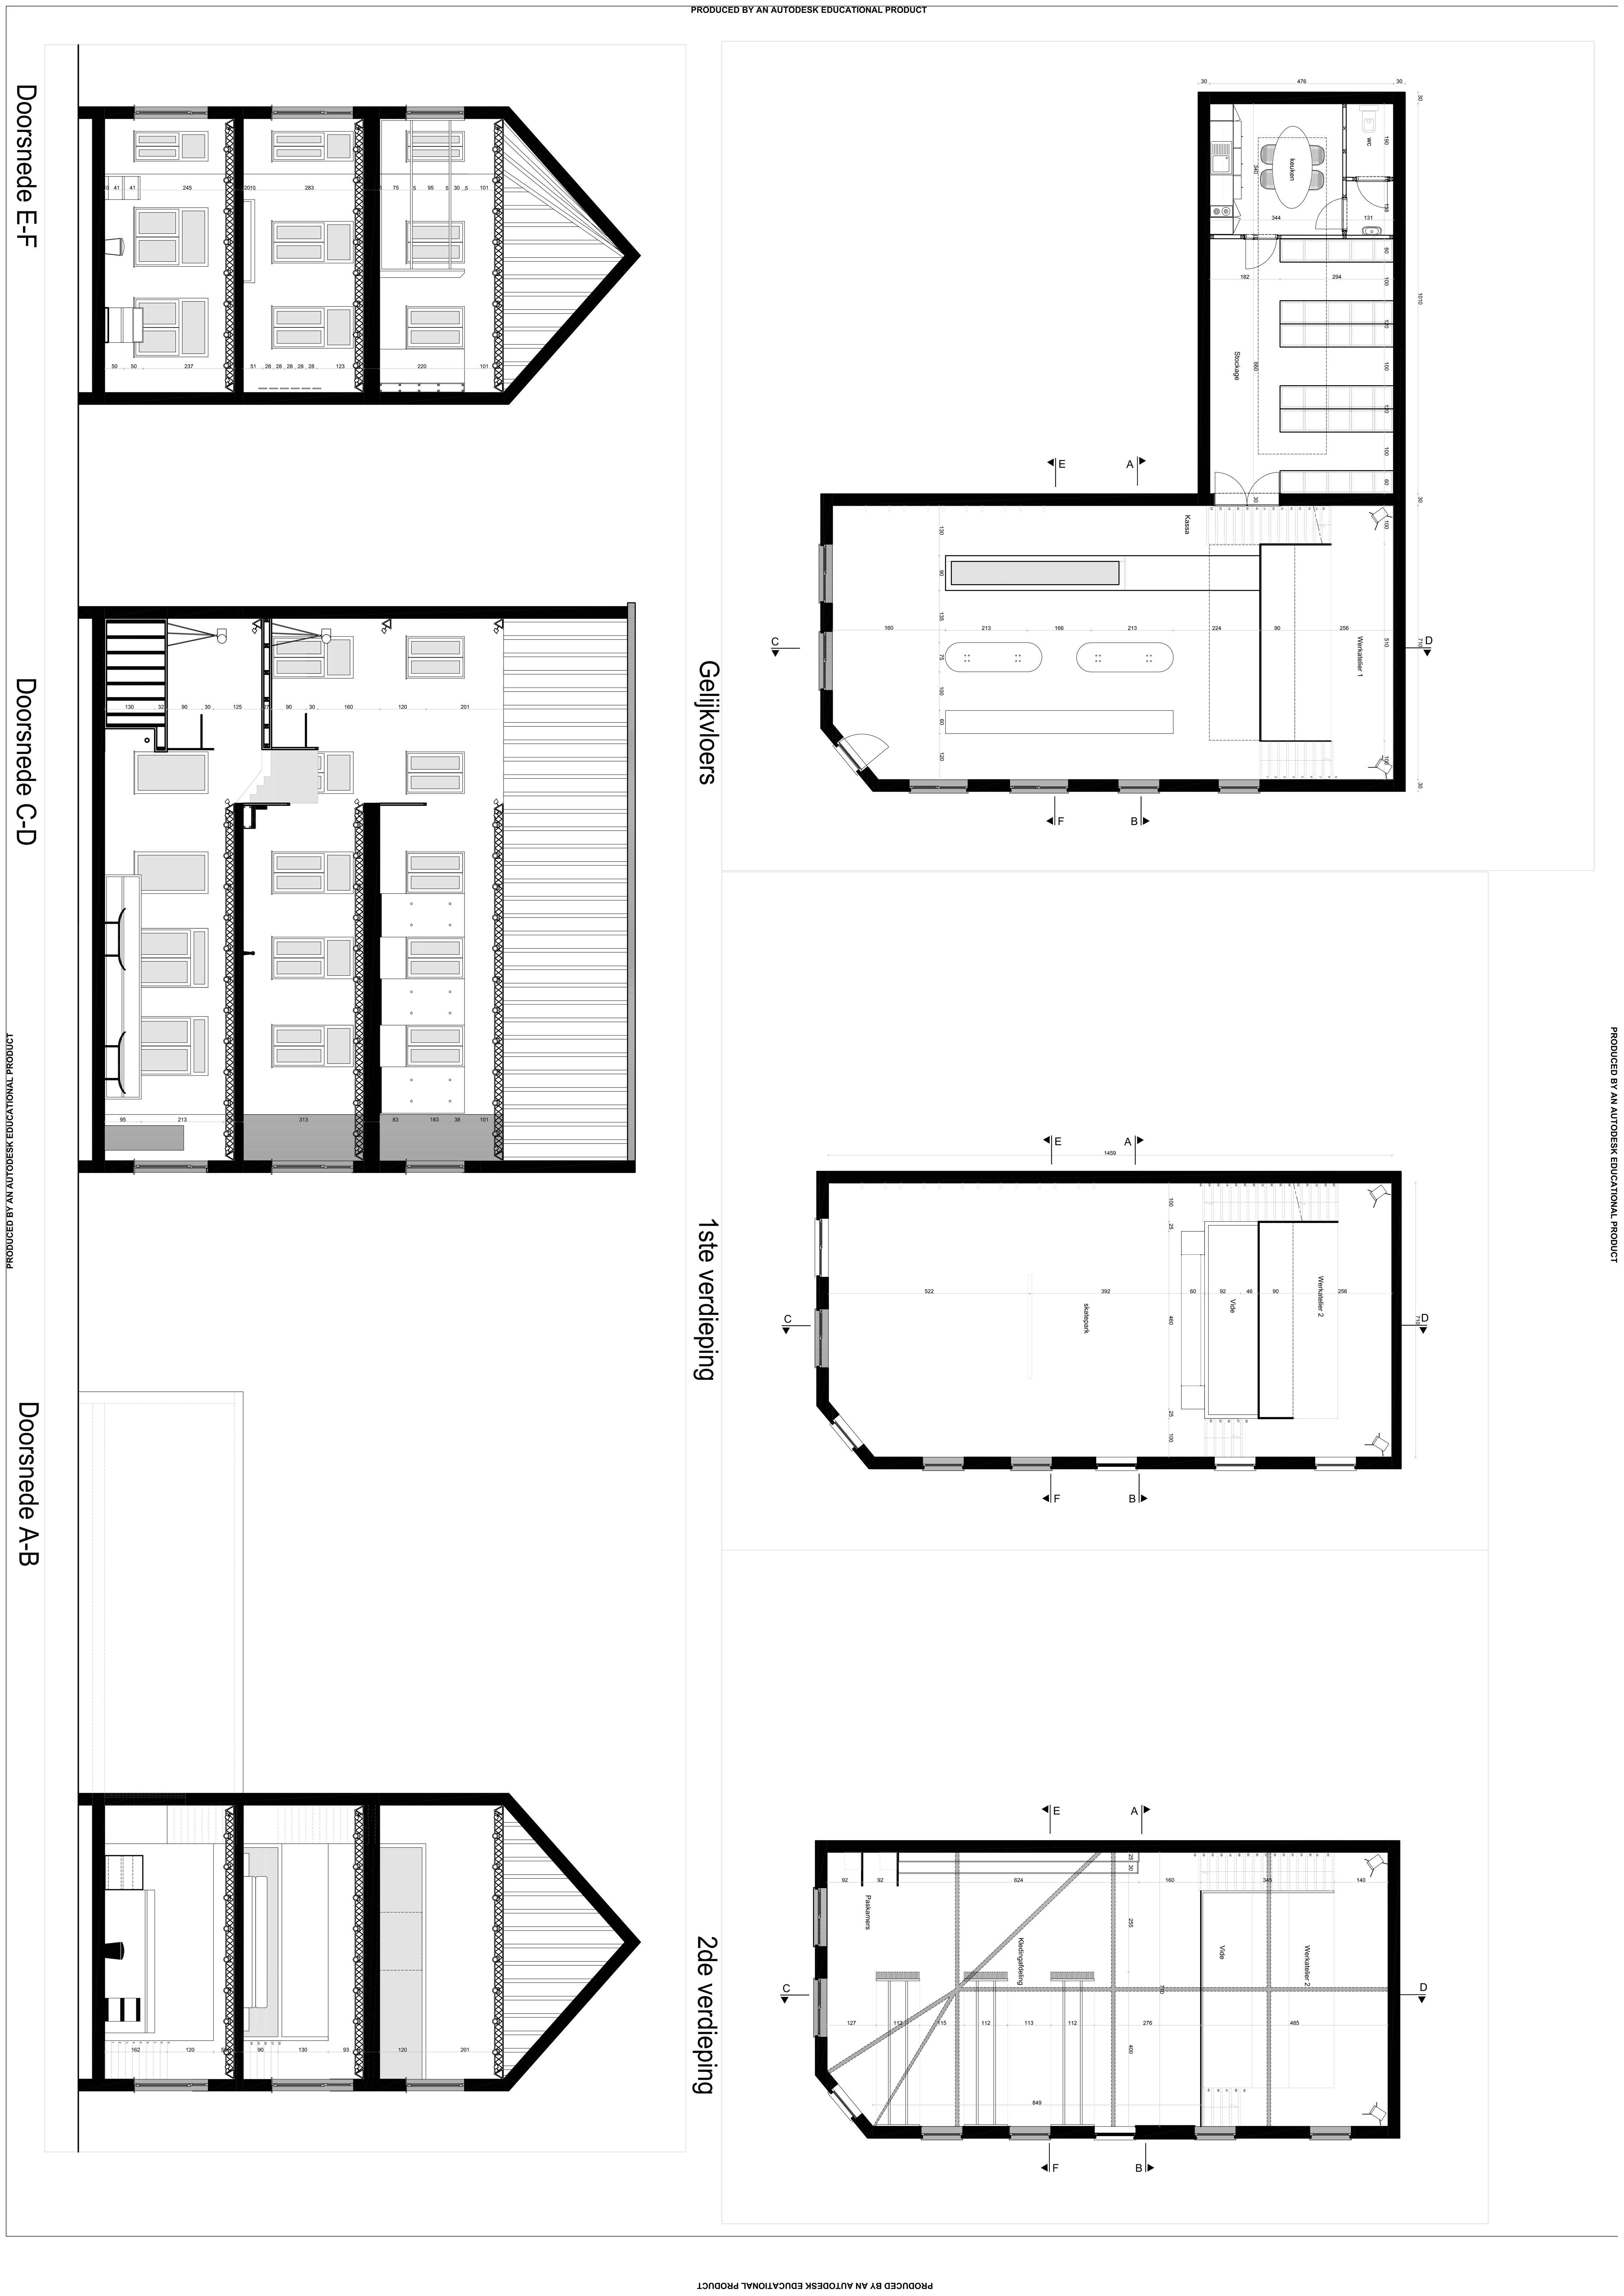 Plannen skateshop - conceptuele opdracht - 2de jaar